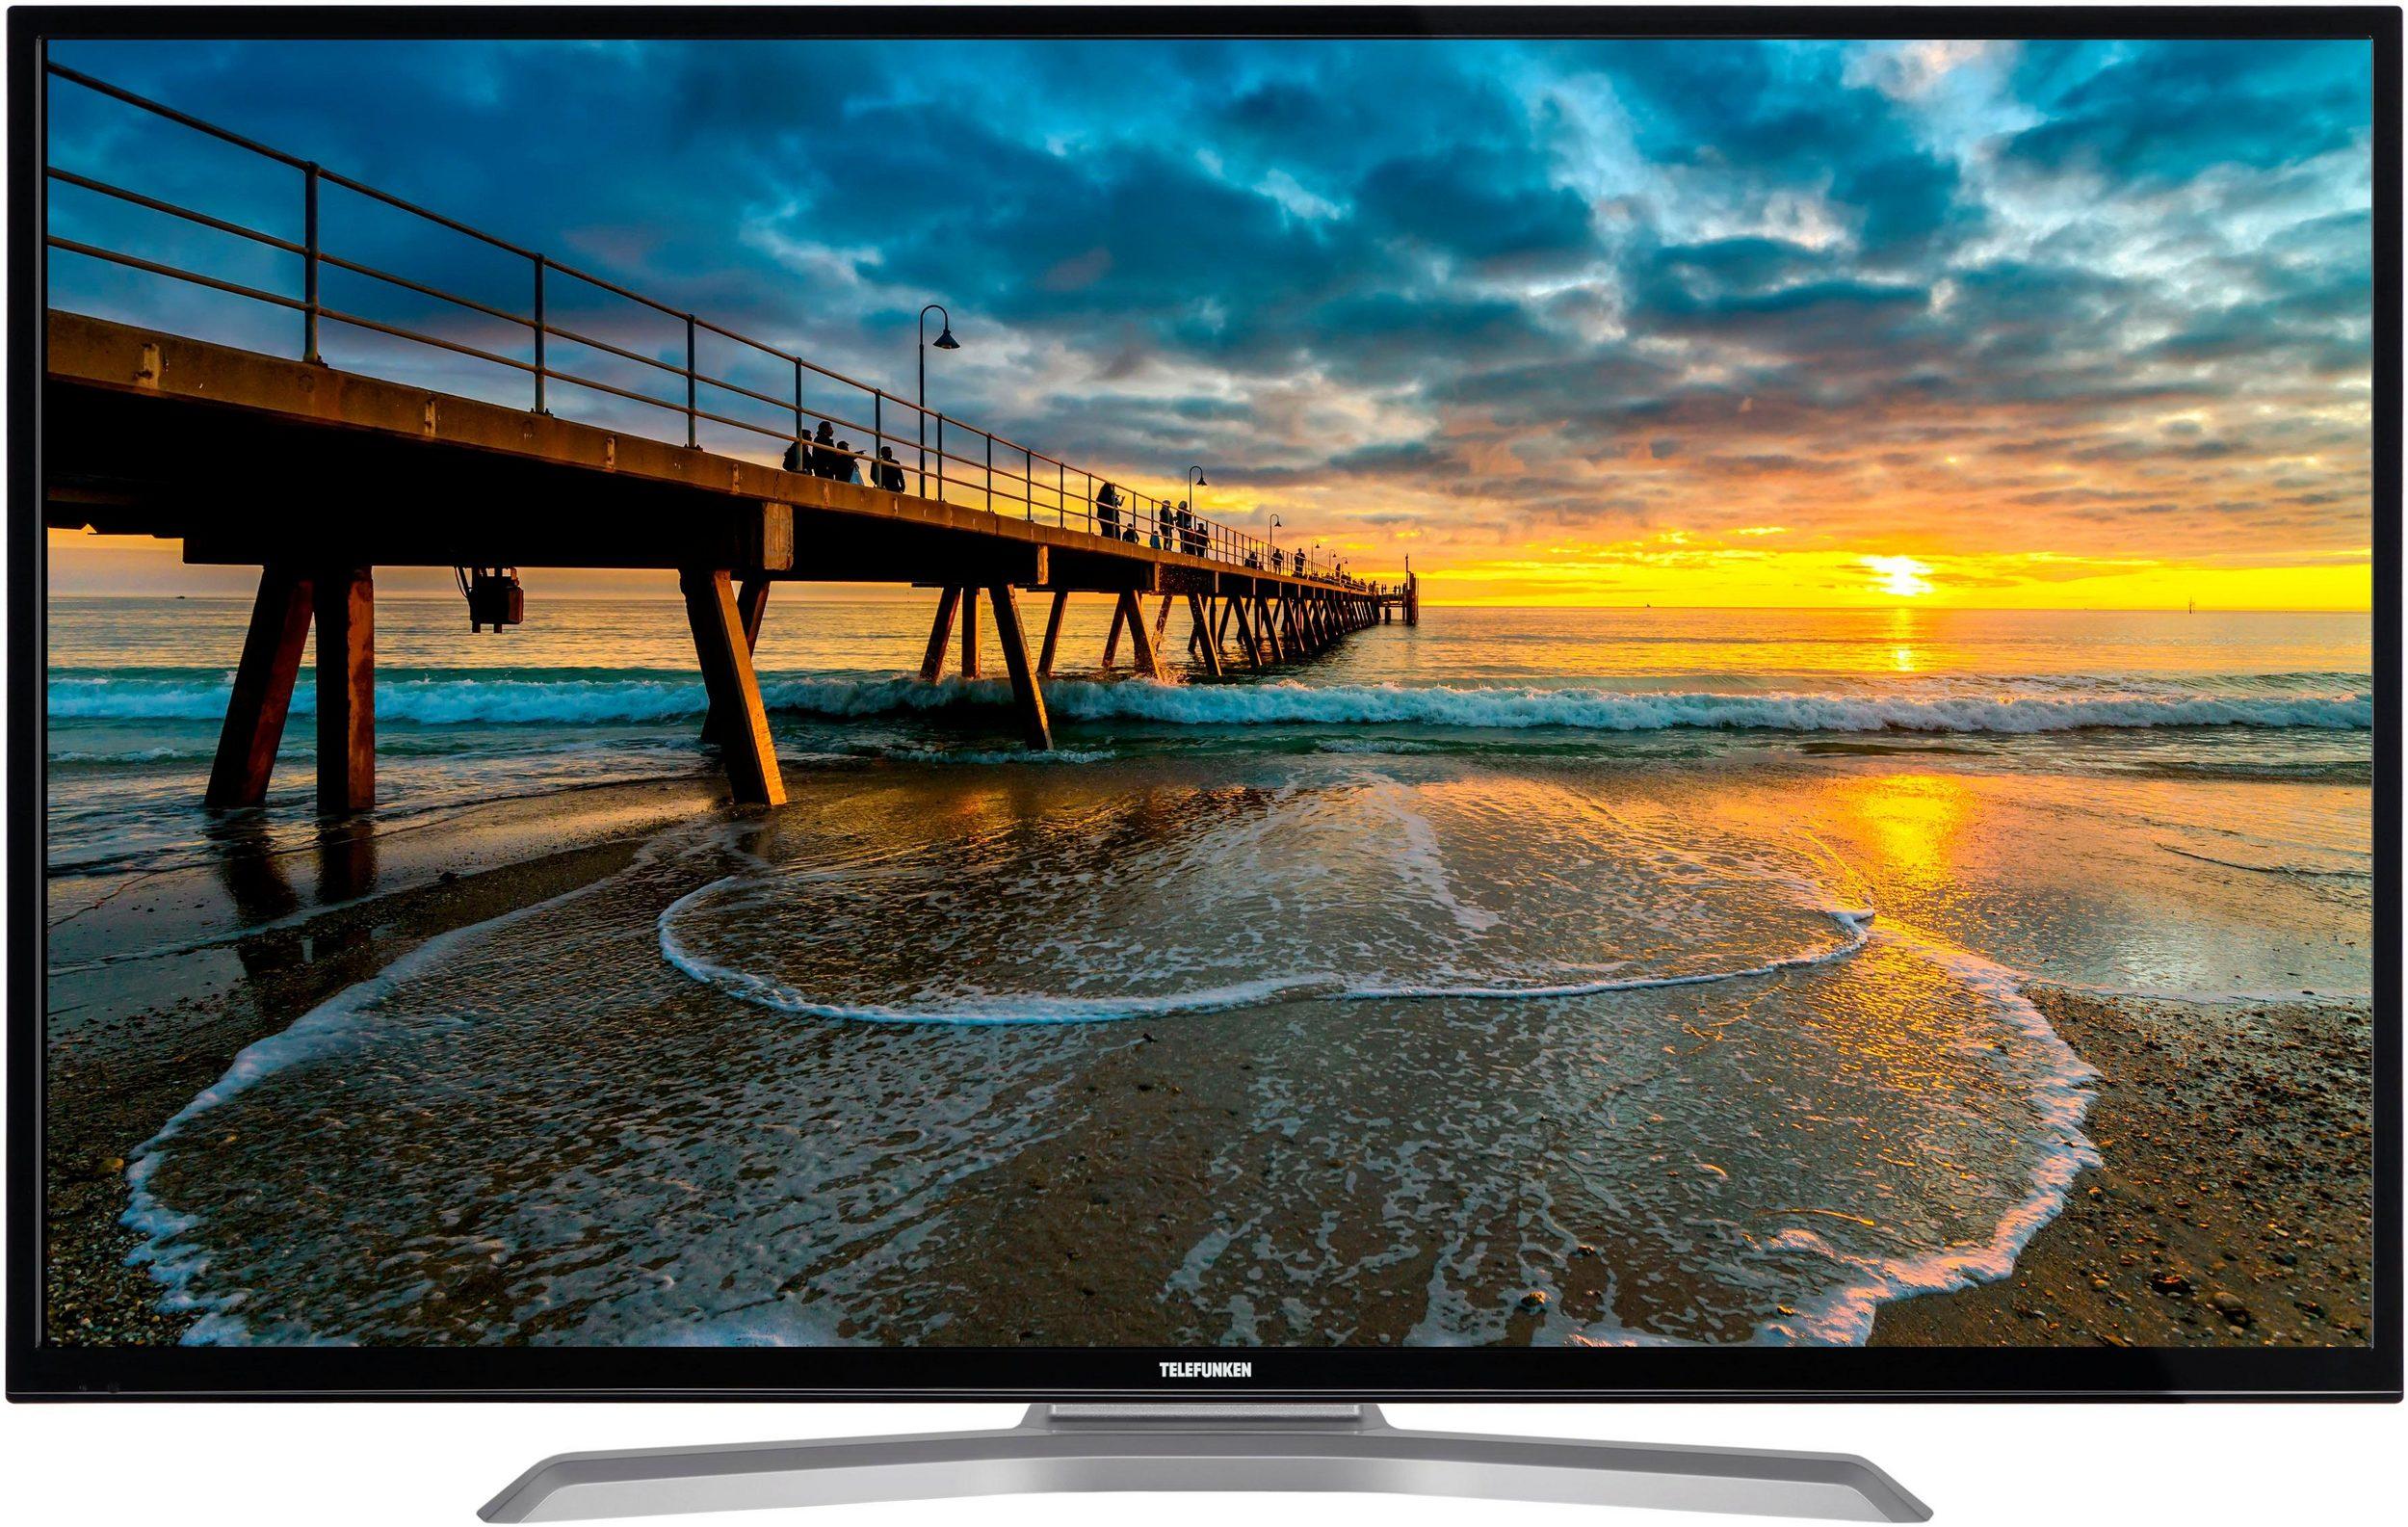 Telefunken D55U700M4CWH - 55 Zoll 4K TV mit HDR, DolbyVision, Hbb, AmazonPrime, Netflix, Triple Tuner, USB Recording